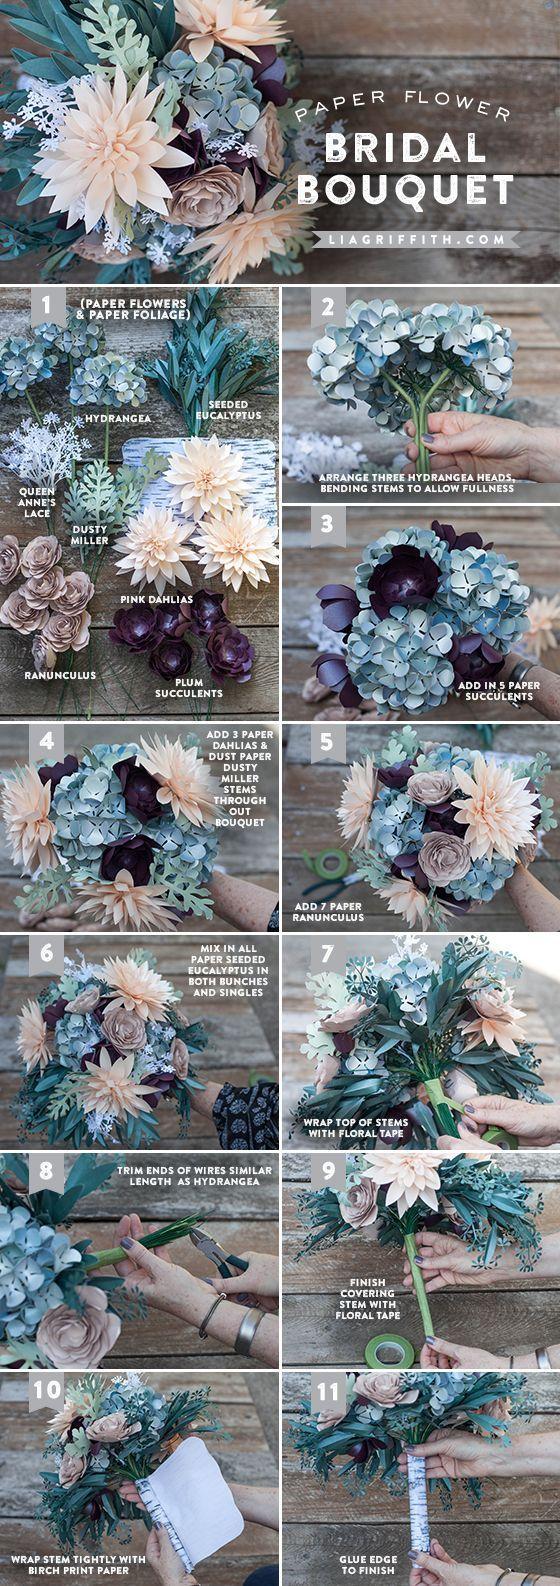 DIY Bridal Bouquet Paper Tutorial